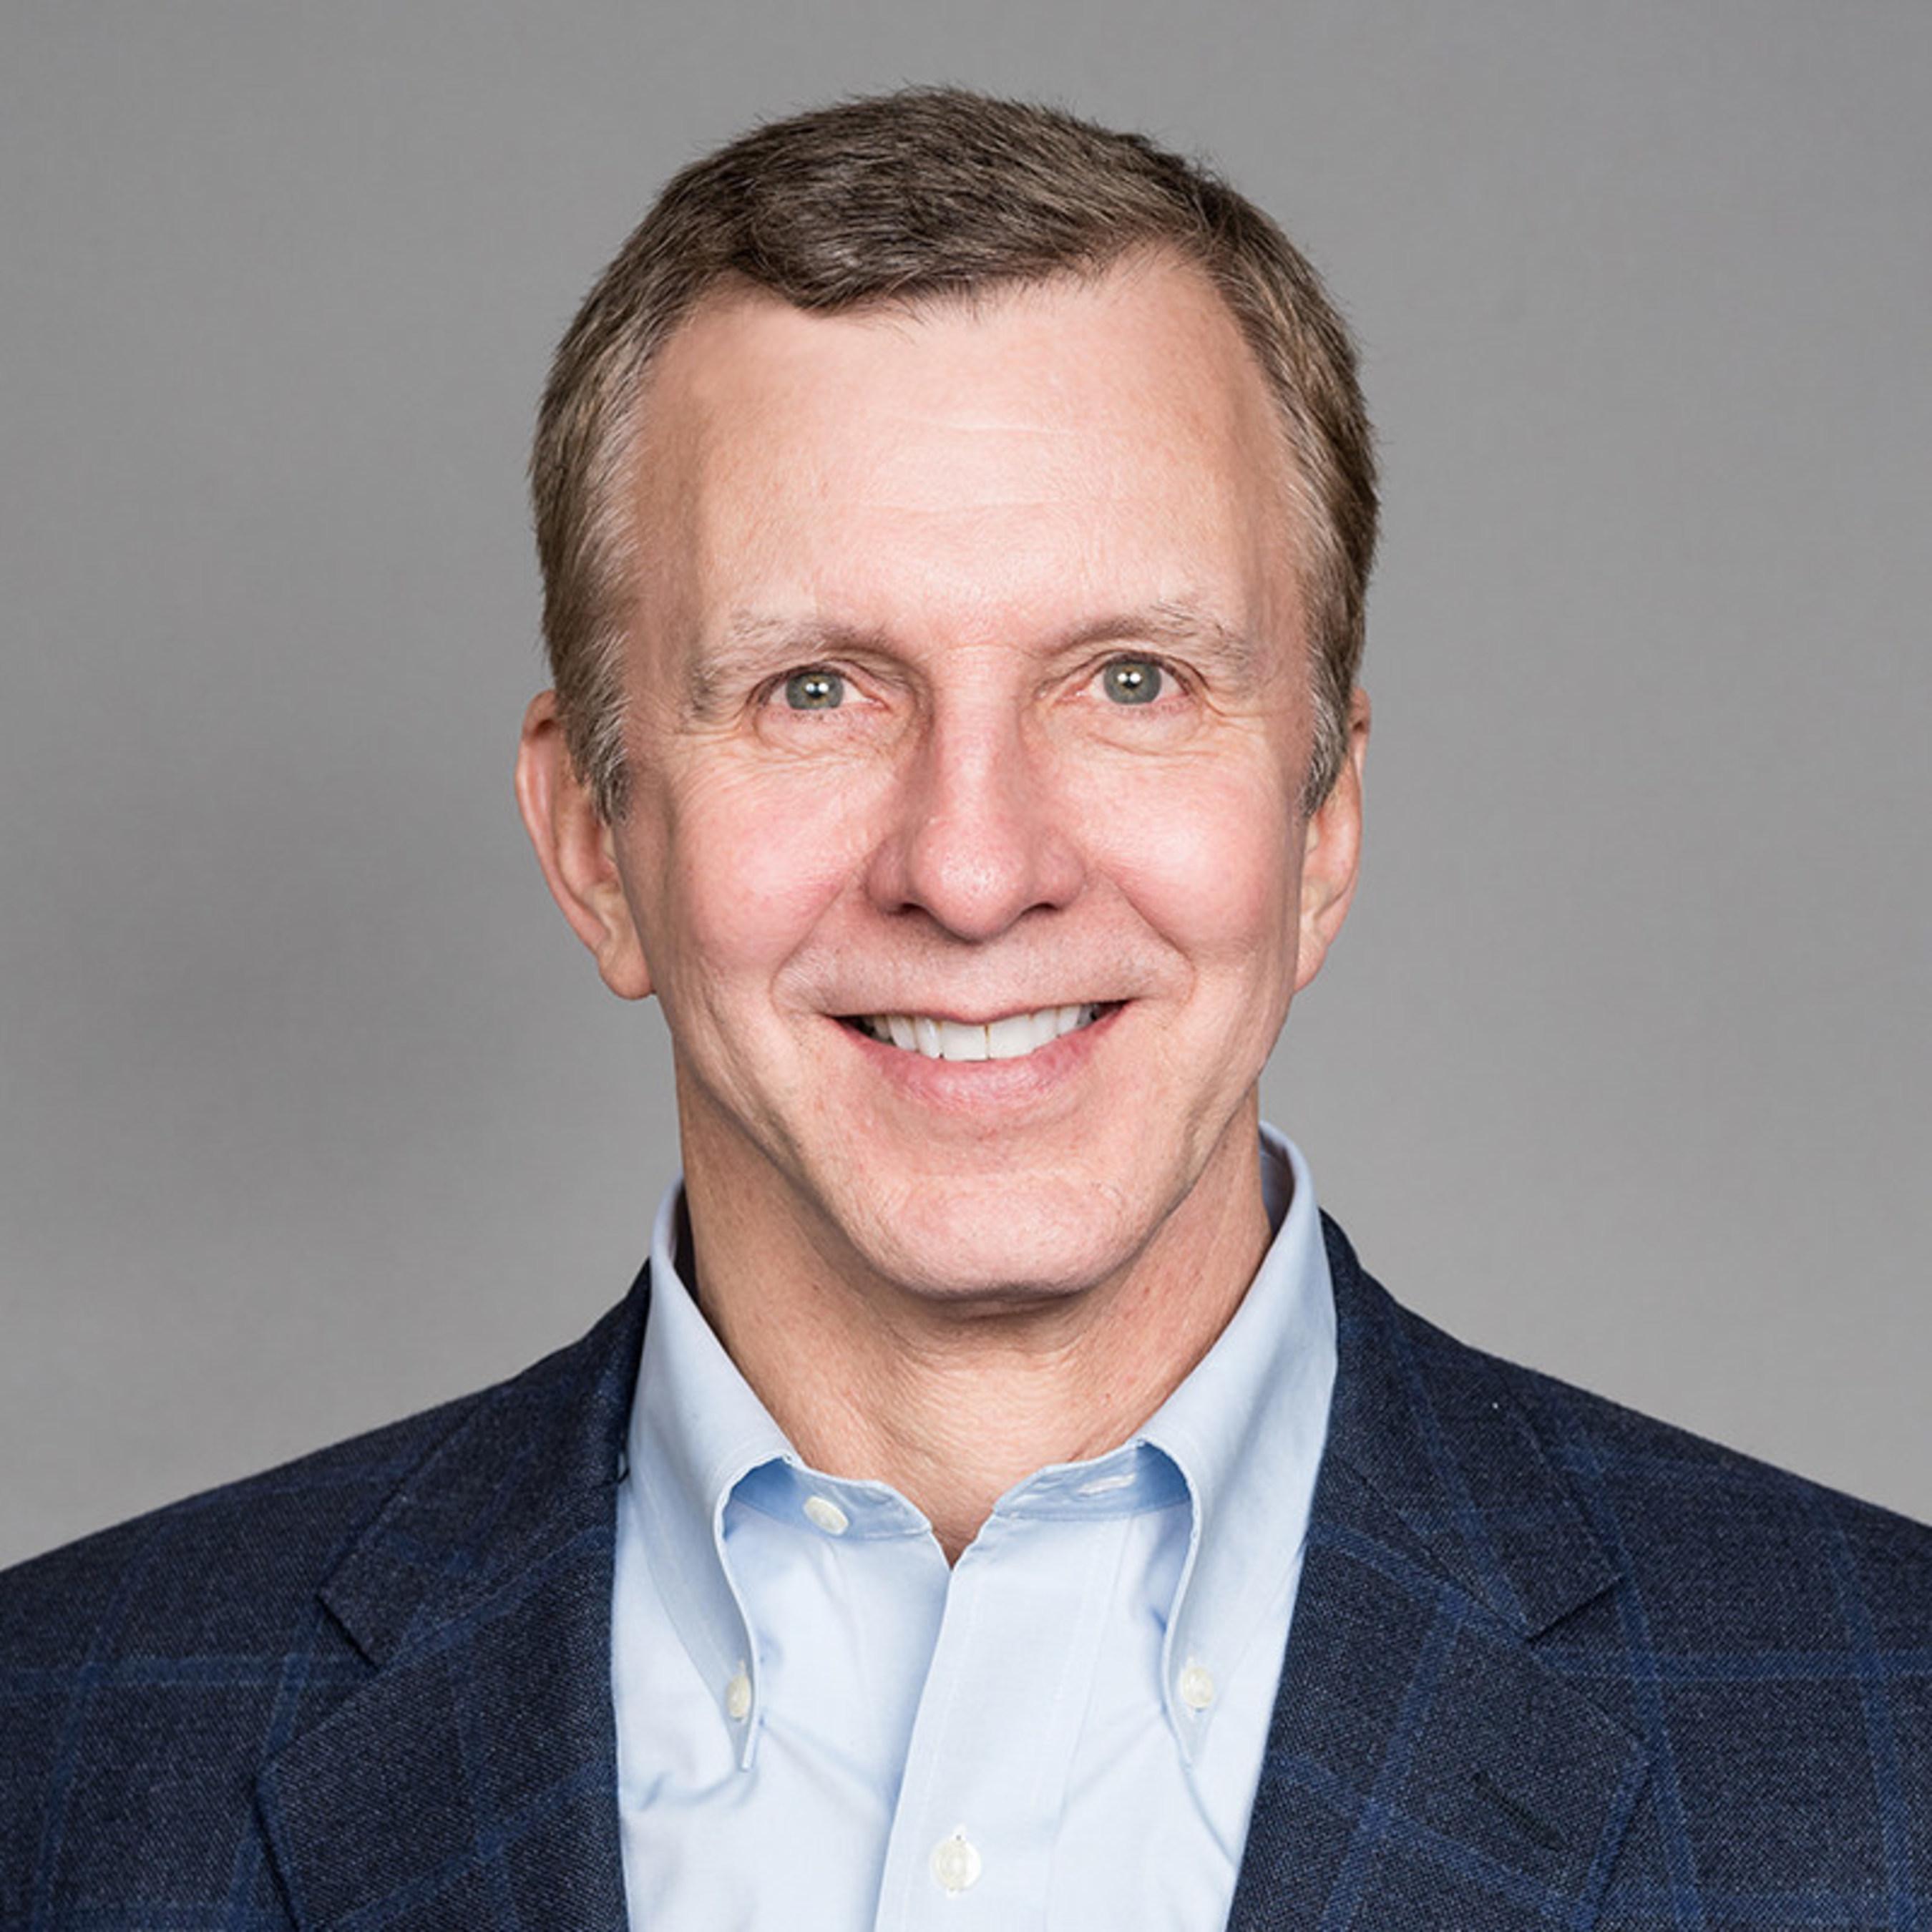 Jim Corey, Managing Partner, Blue Ridge Partners